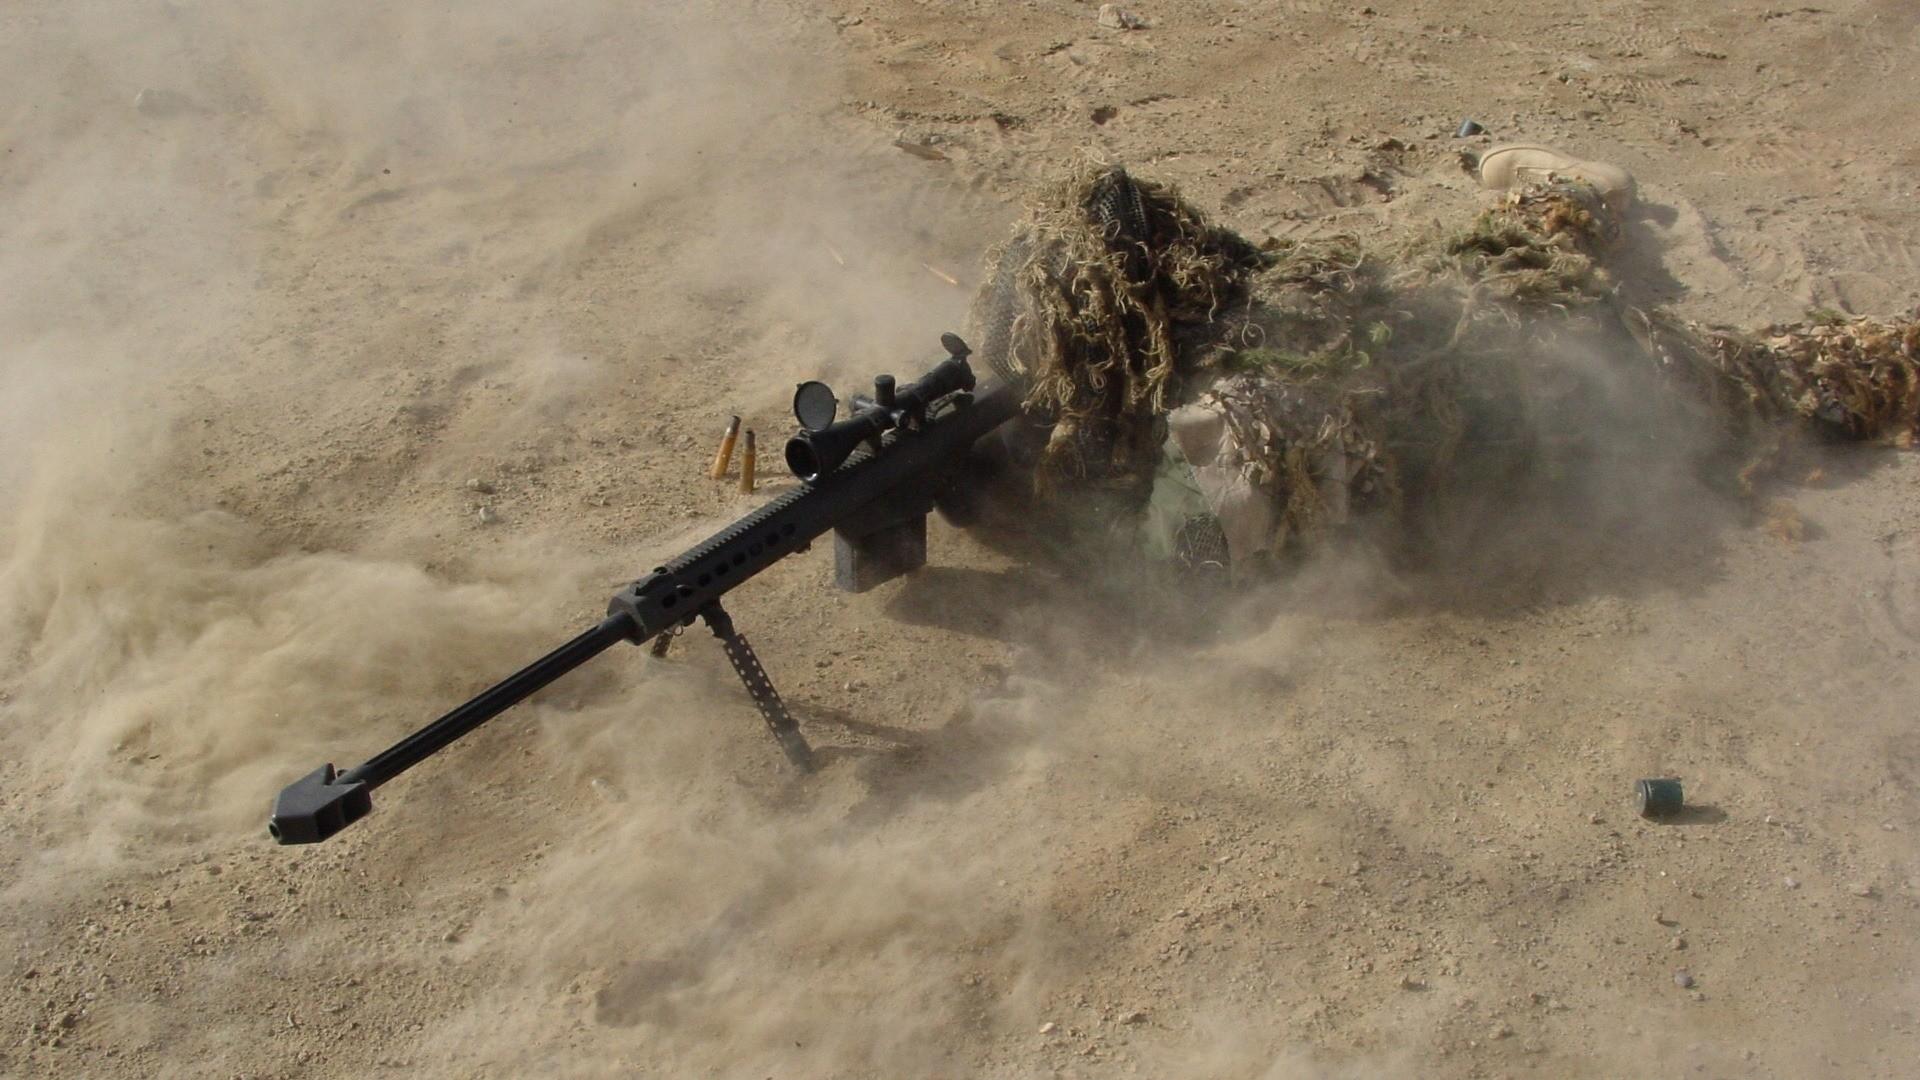 Sniper Wallpaper 1080p hd background hd screensavers hd wallpaper .